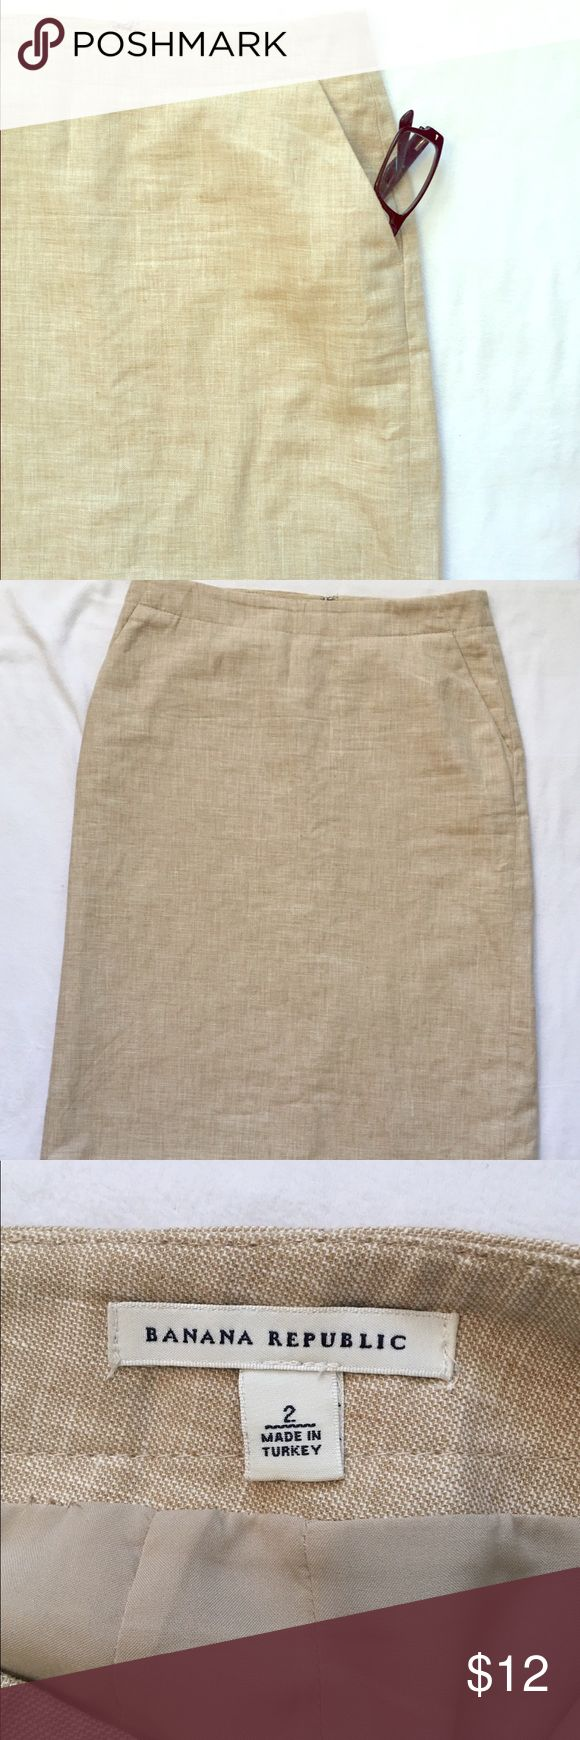 Banana Republic Khaki Pencil Skirt Size 2 Knee length. Nylon lines. Work casual or sporty. Banana Republic Skirts Pencil